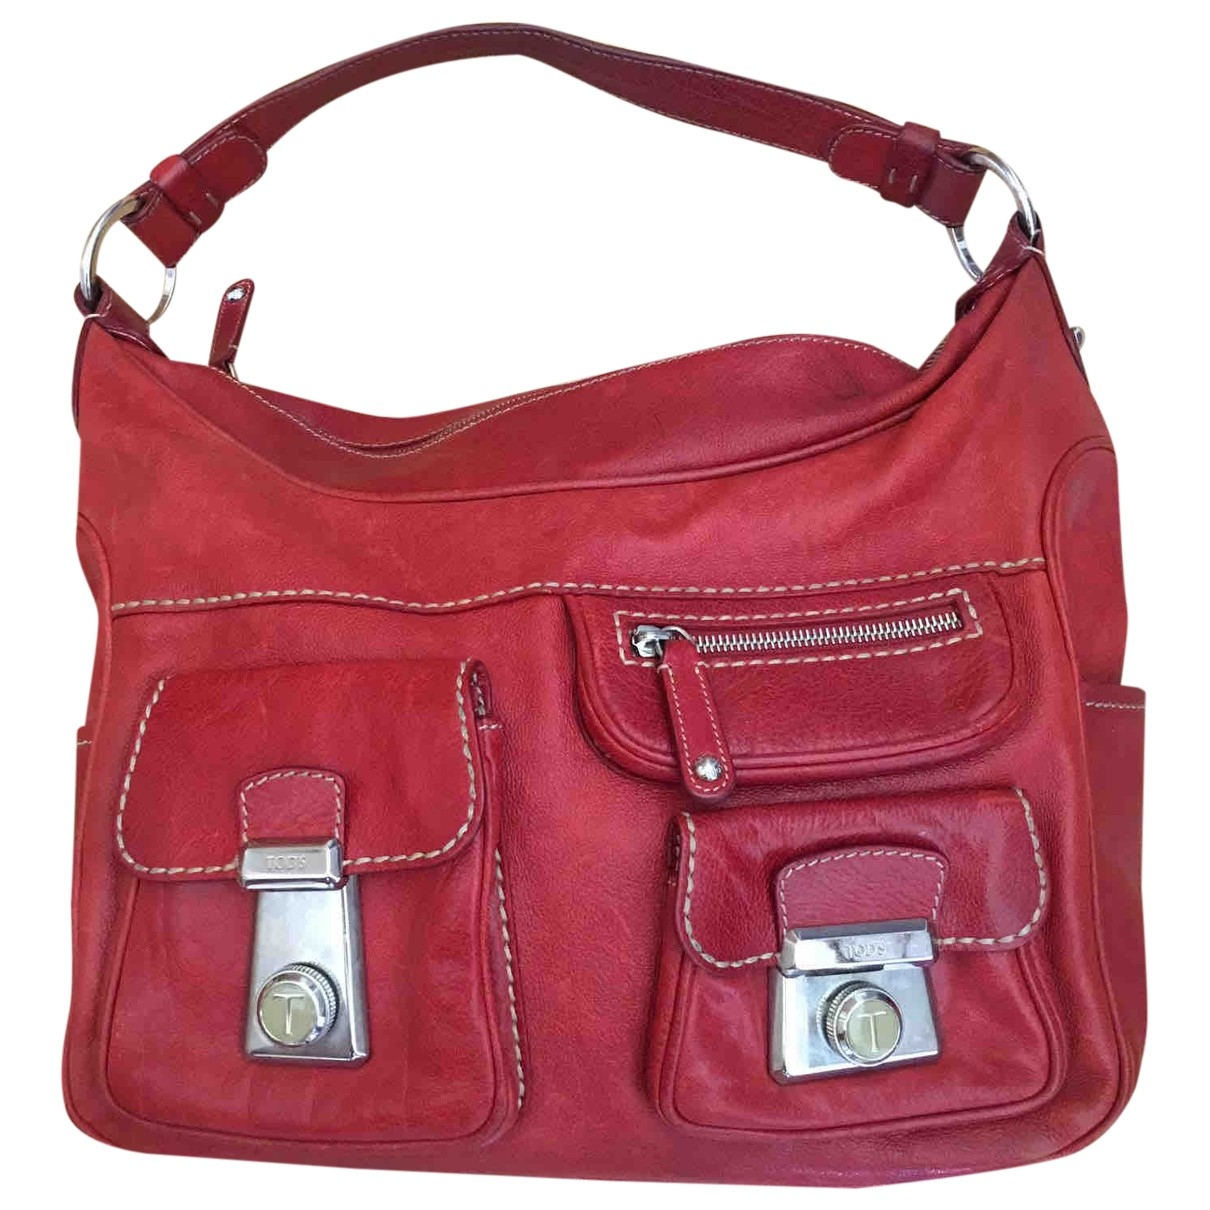 Tods \N Red Leather handbag for Women \N